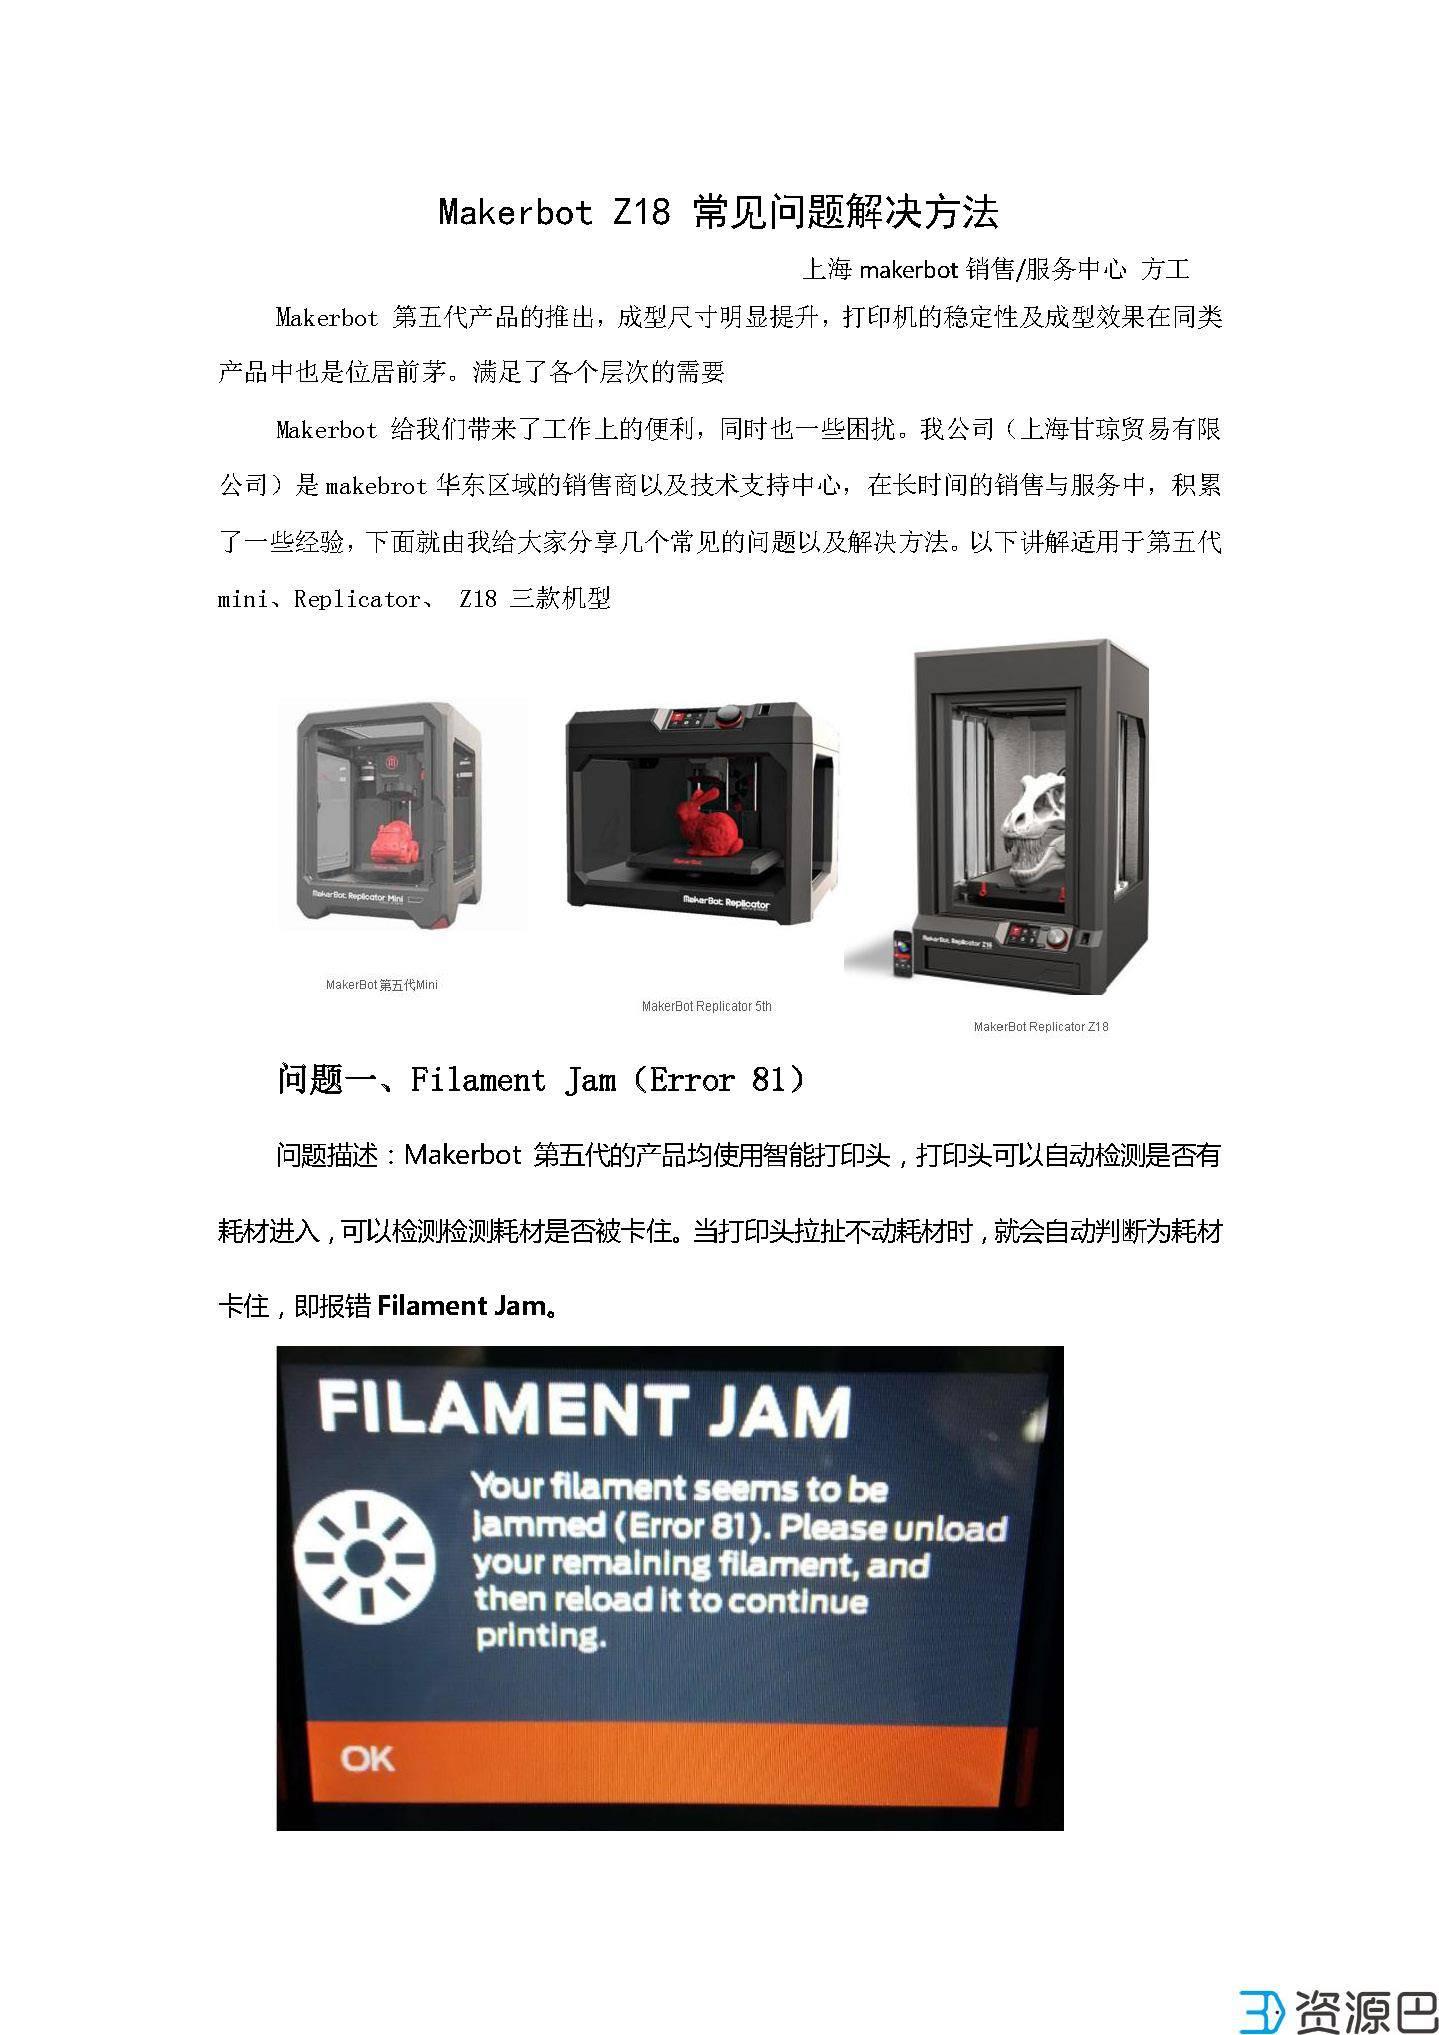 MakerBot Replicator 3d打印机 技术文档插图1